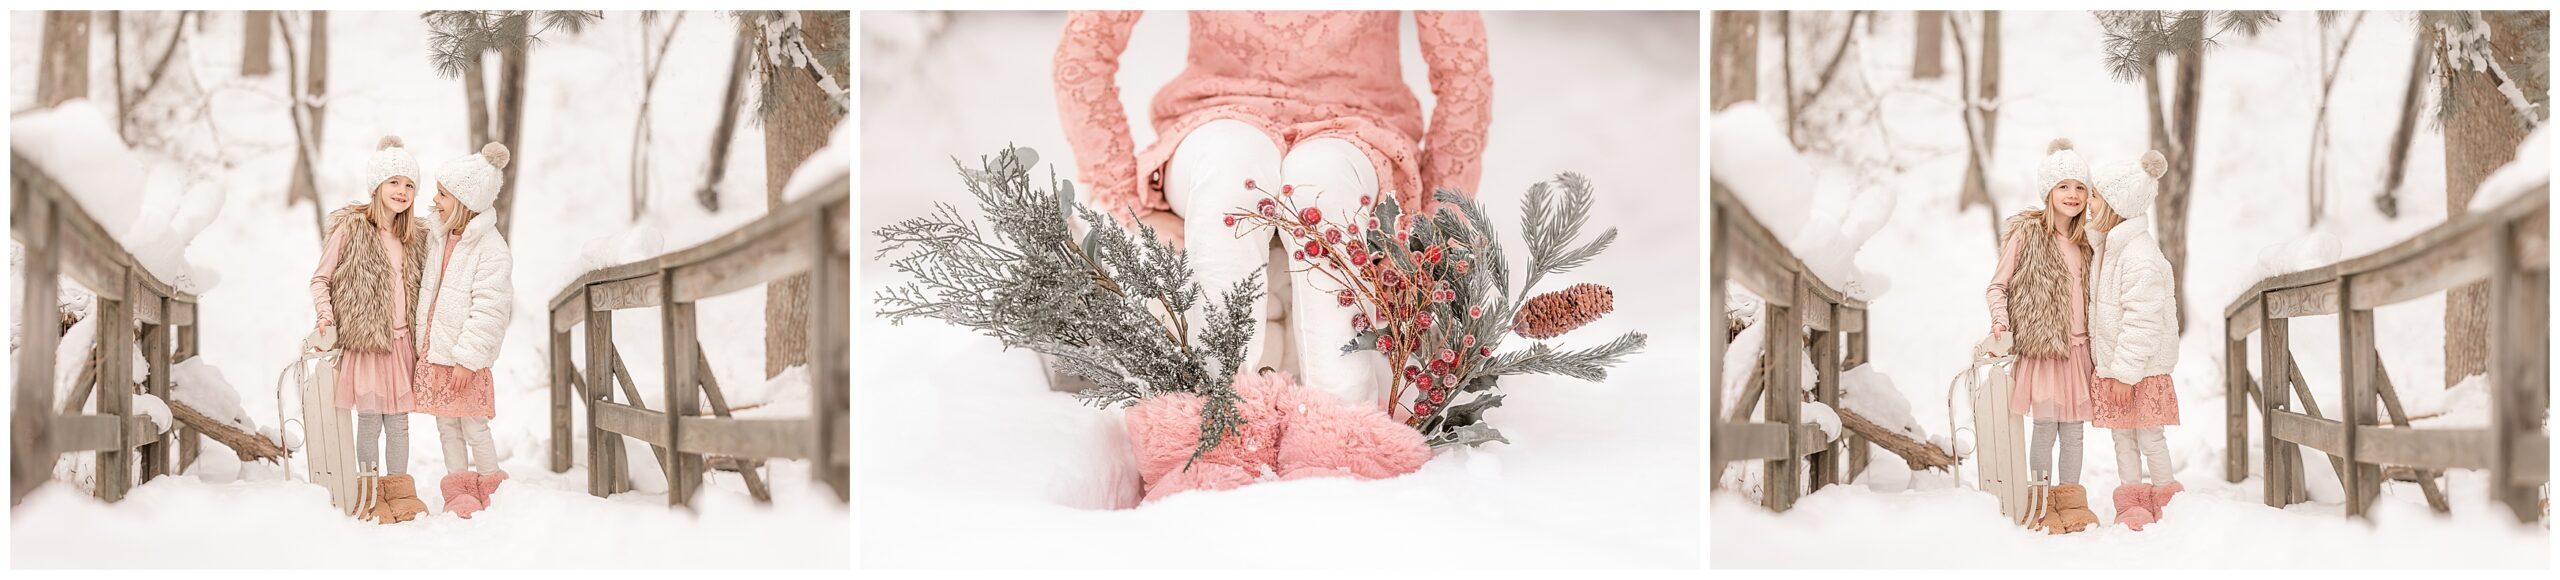 Pamela Salai Photography snow mini session